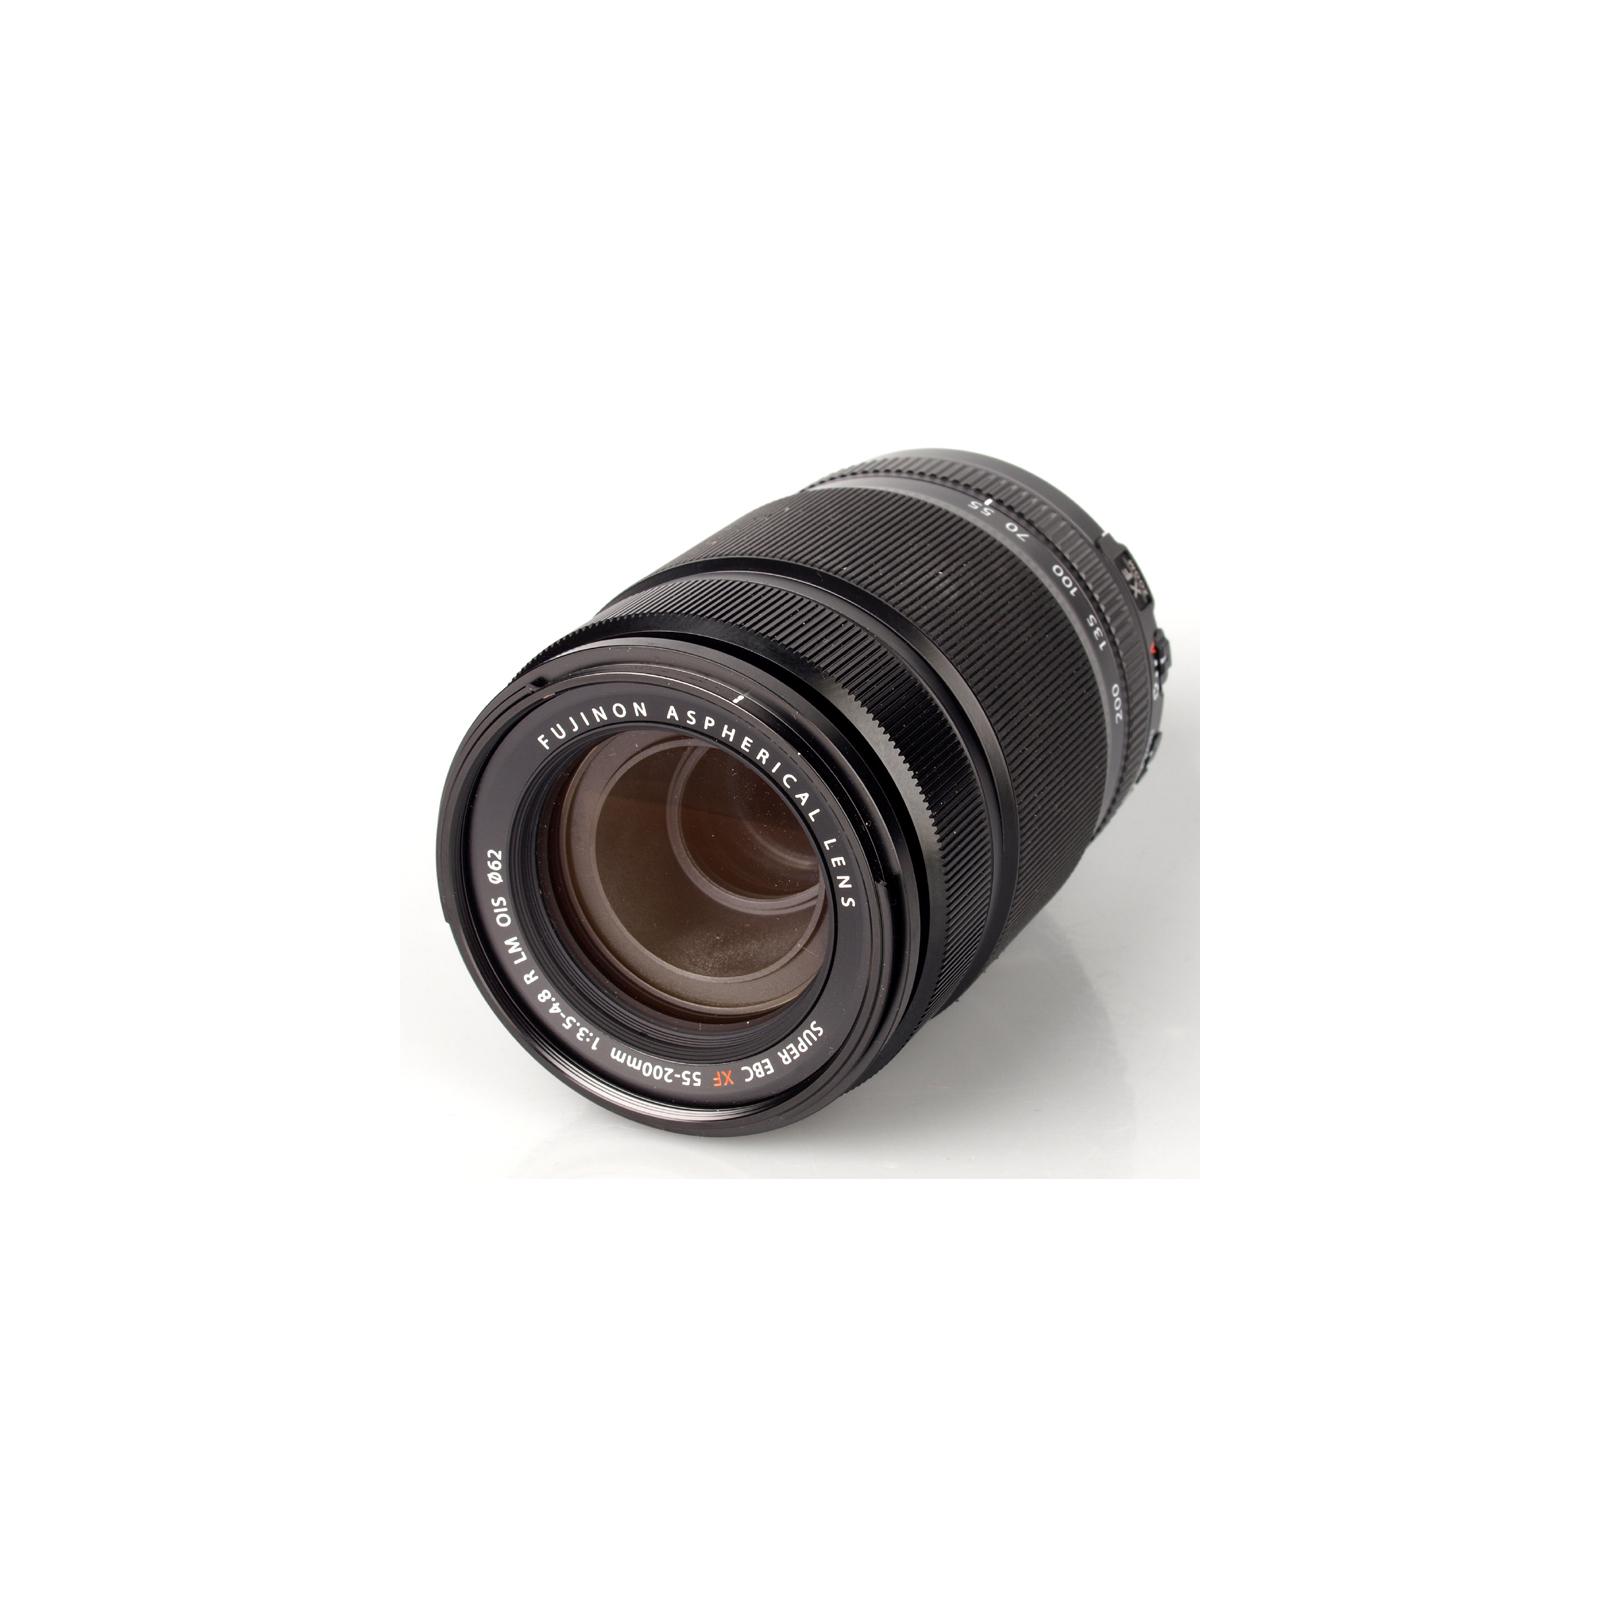 Объектив Fujifilm XF 55-200mm F3.5-4.8 OIS (16384941) изображение 5